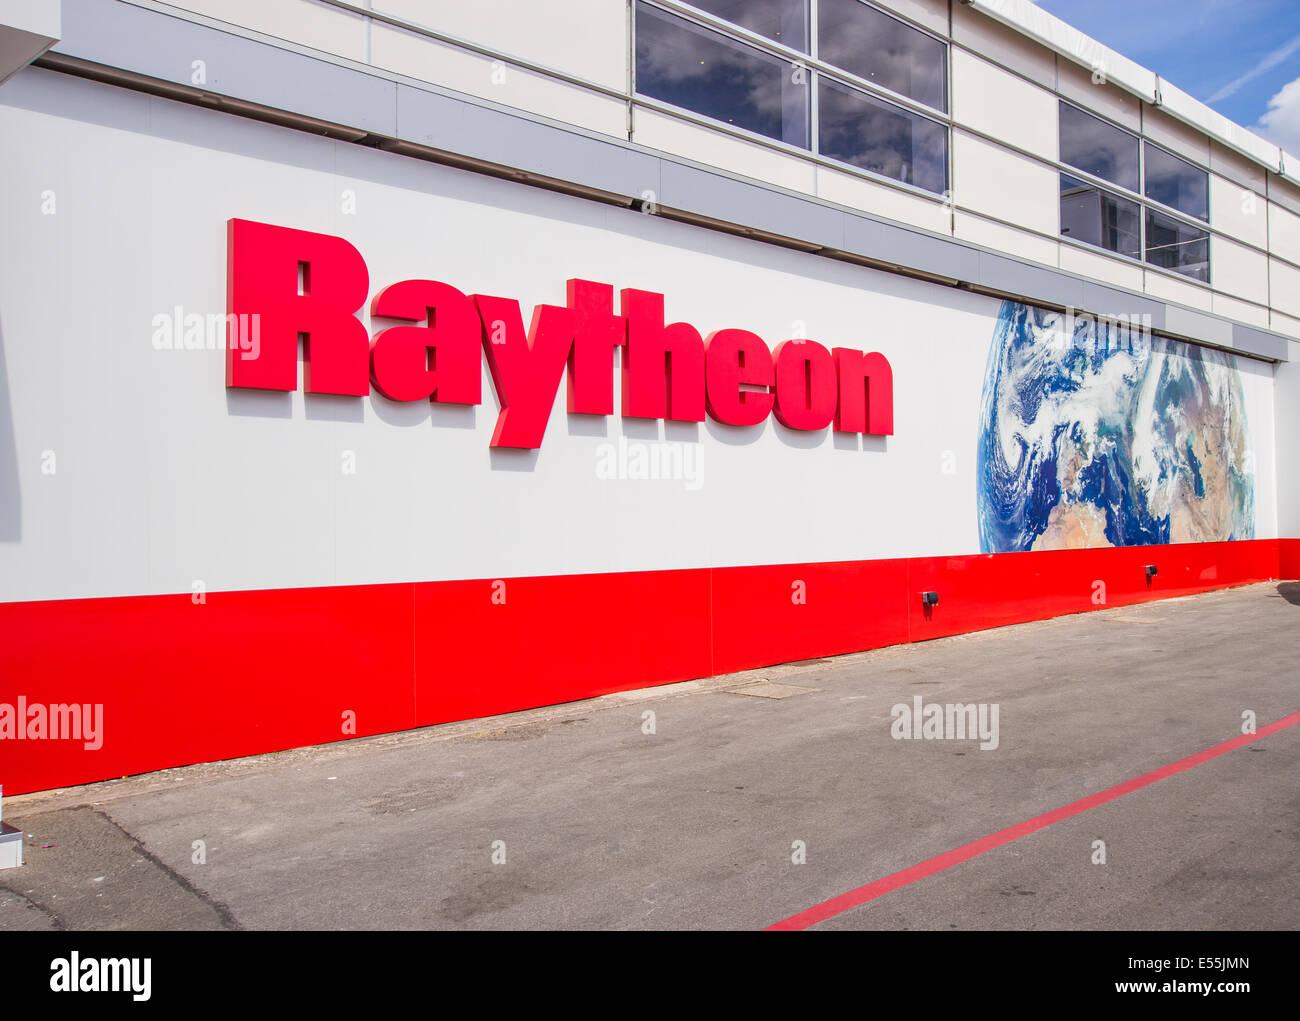 Raytheon sign At Farnborough International Air Show July 15th 2014 - Stock Image